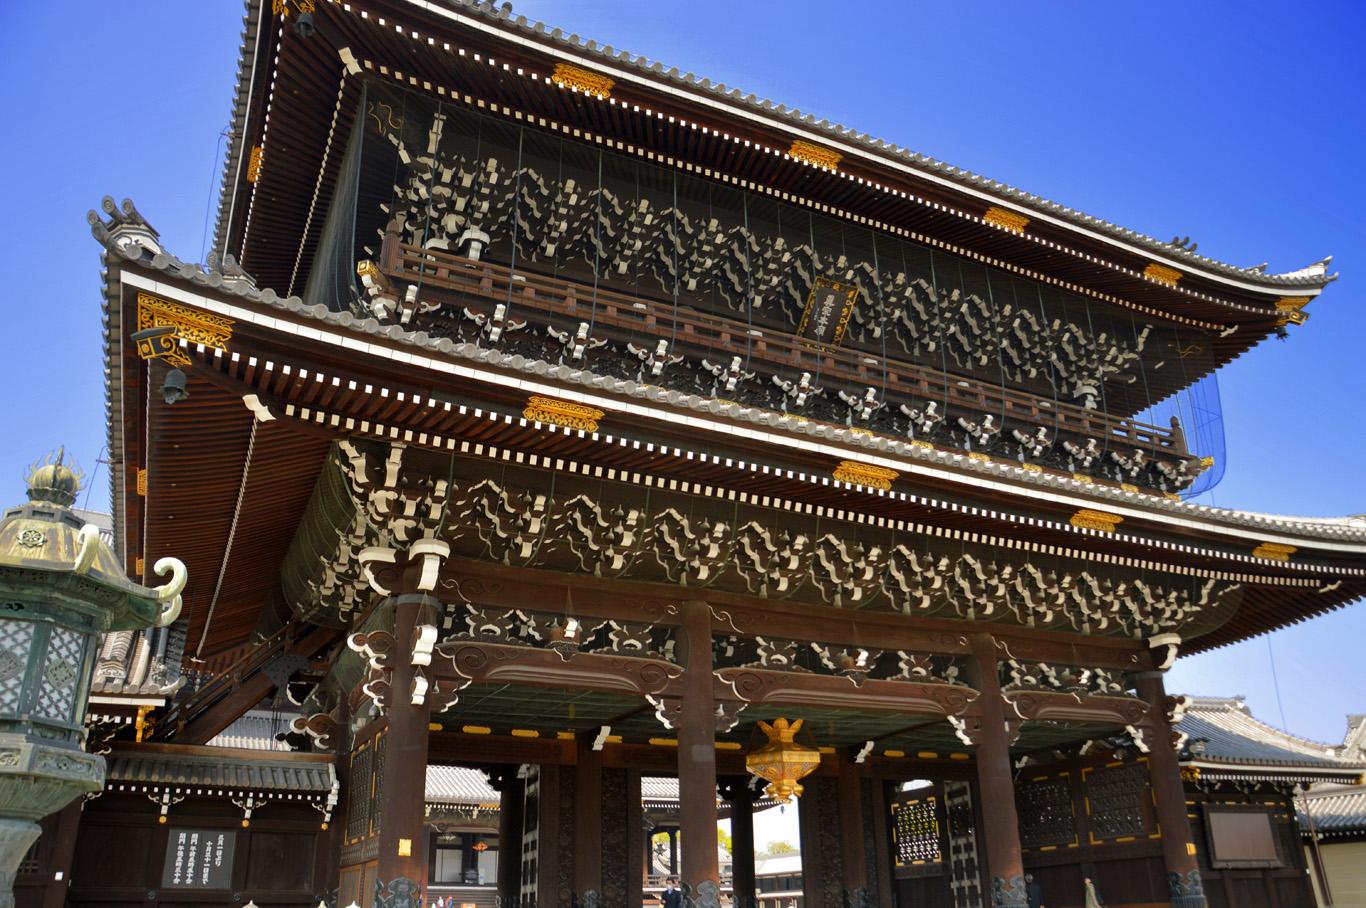 Nanzen-Ji Temple in Kyoto - the size is unimaginable